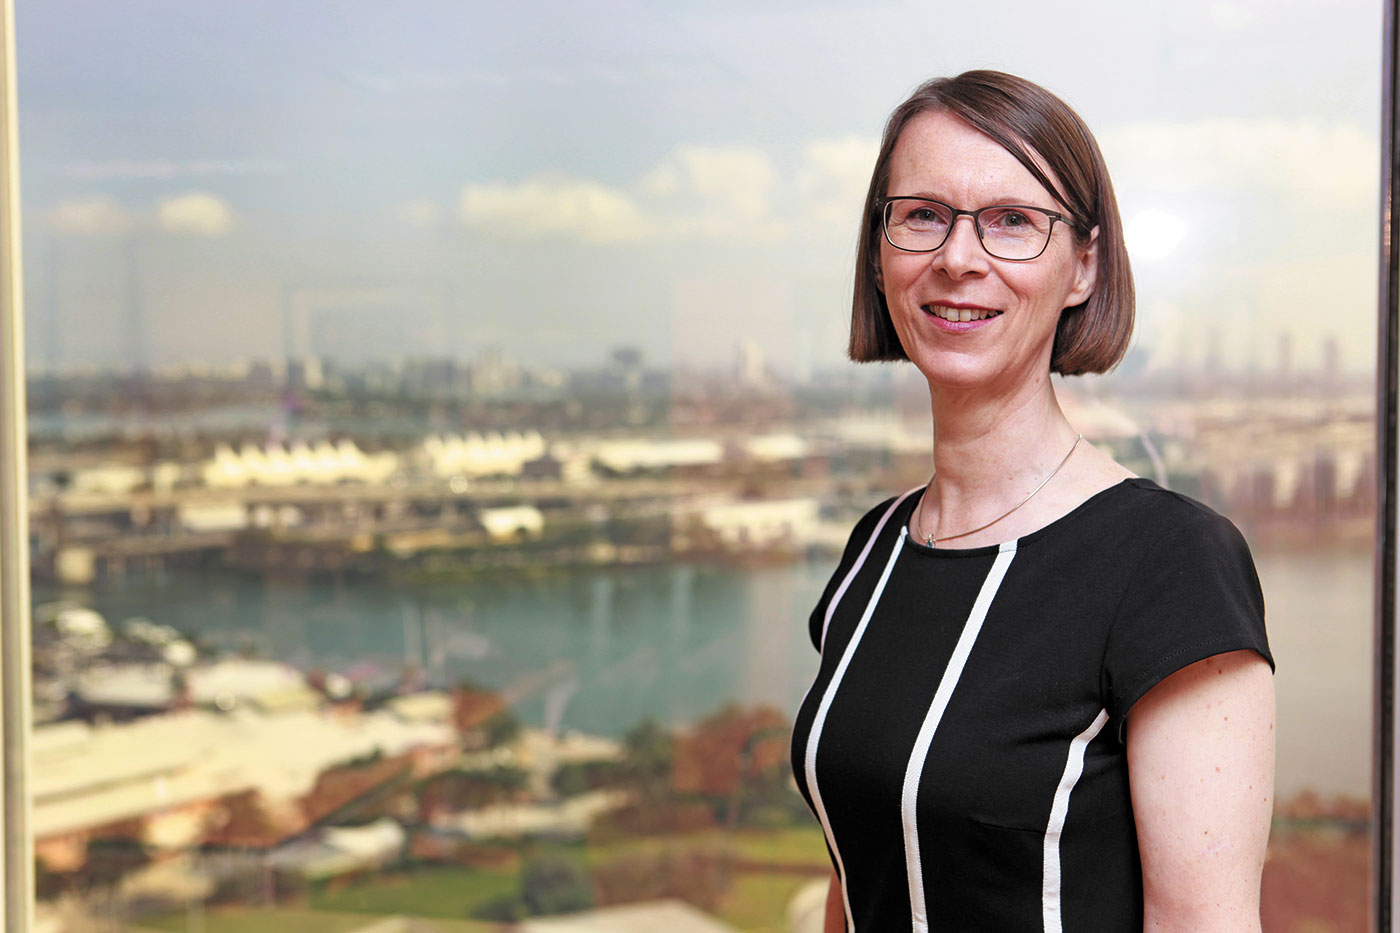 Annette Klein: German consul general targets economic, academic ties